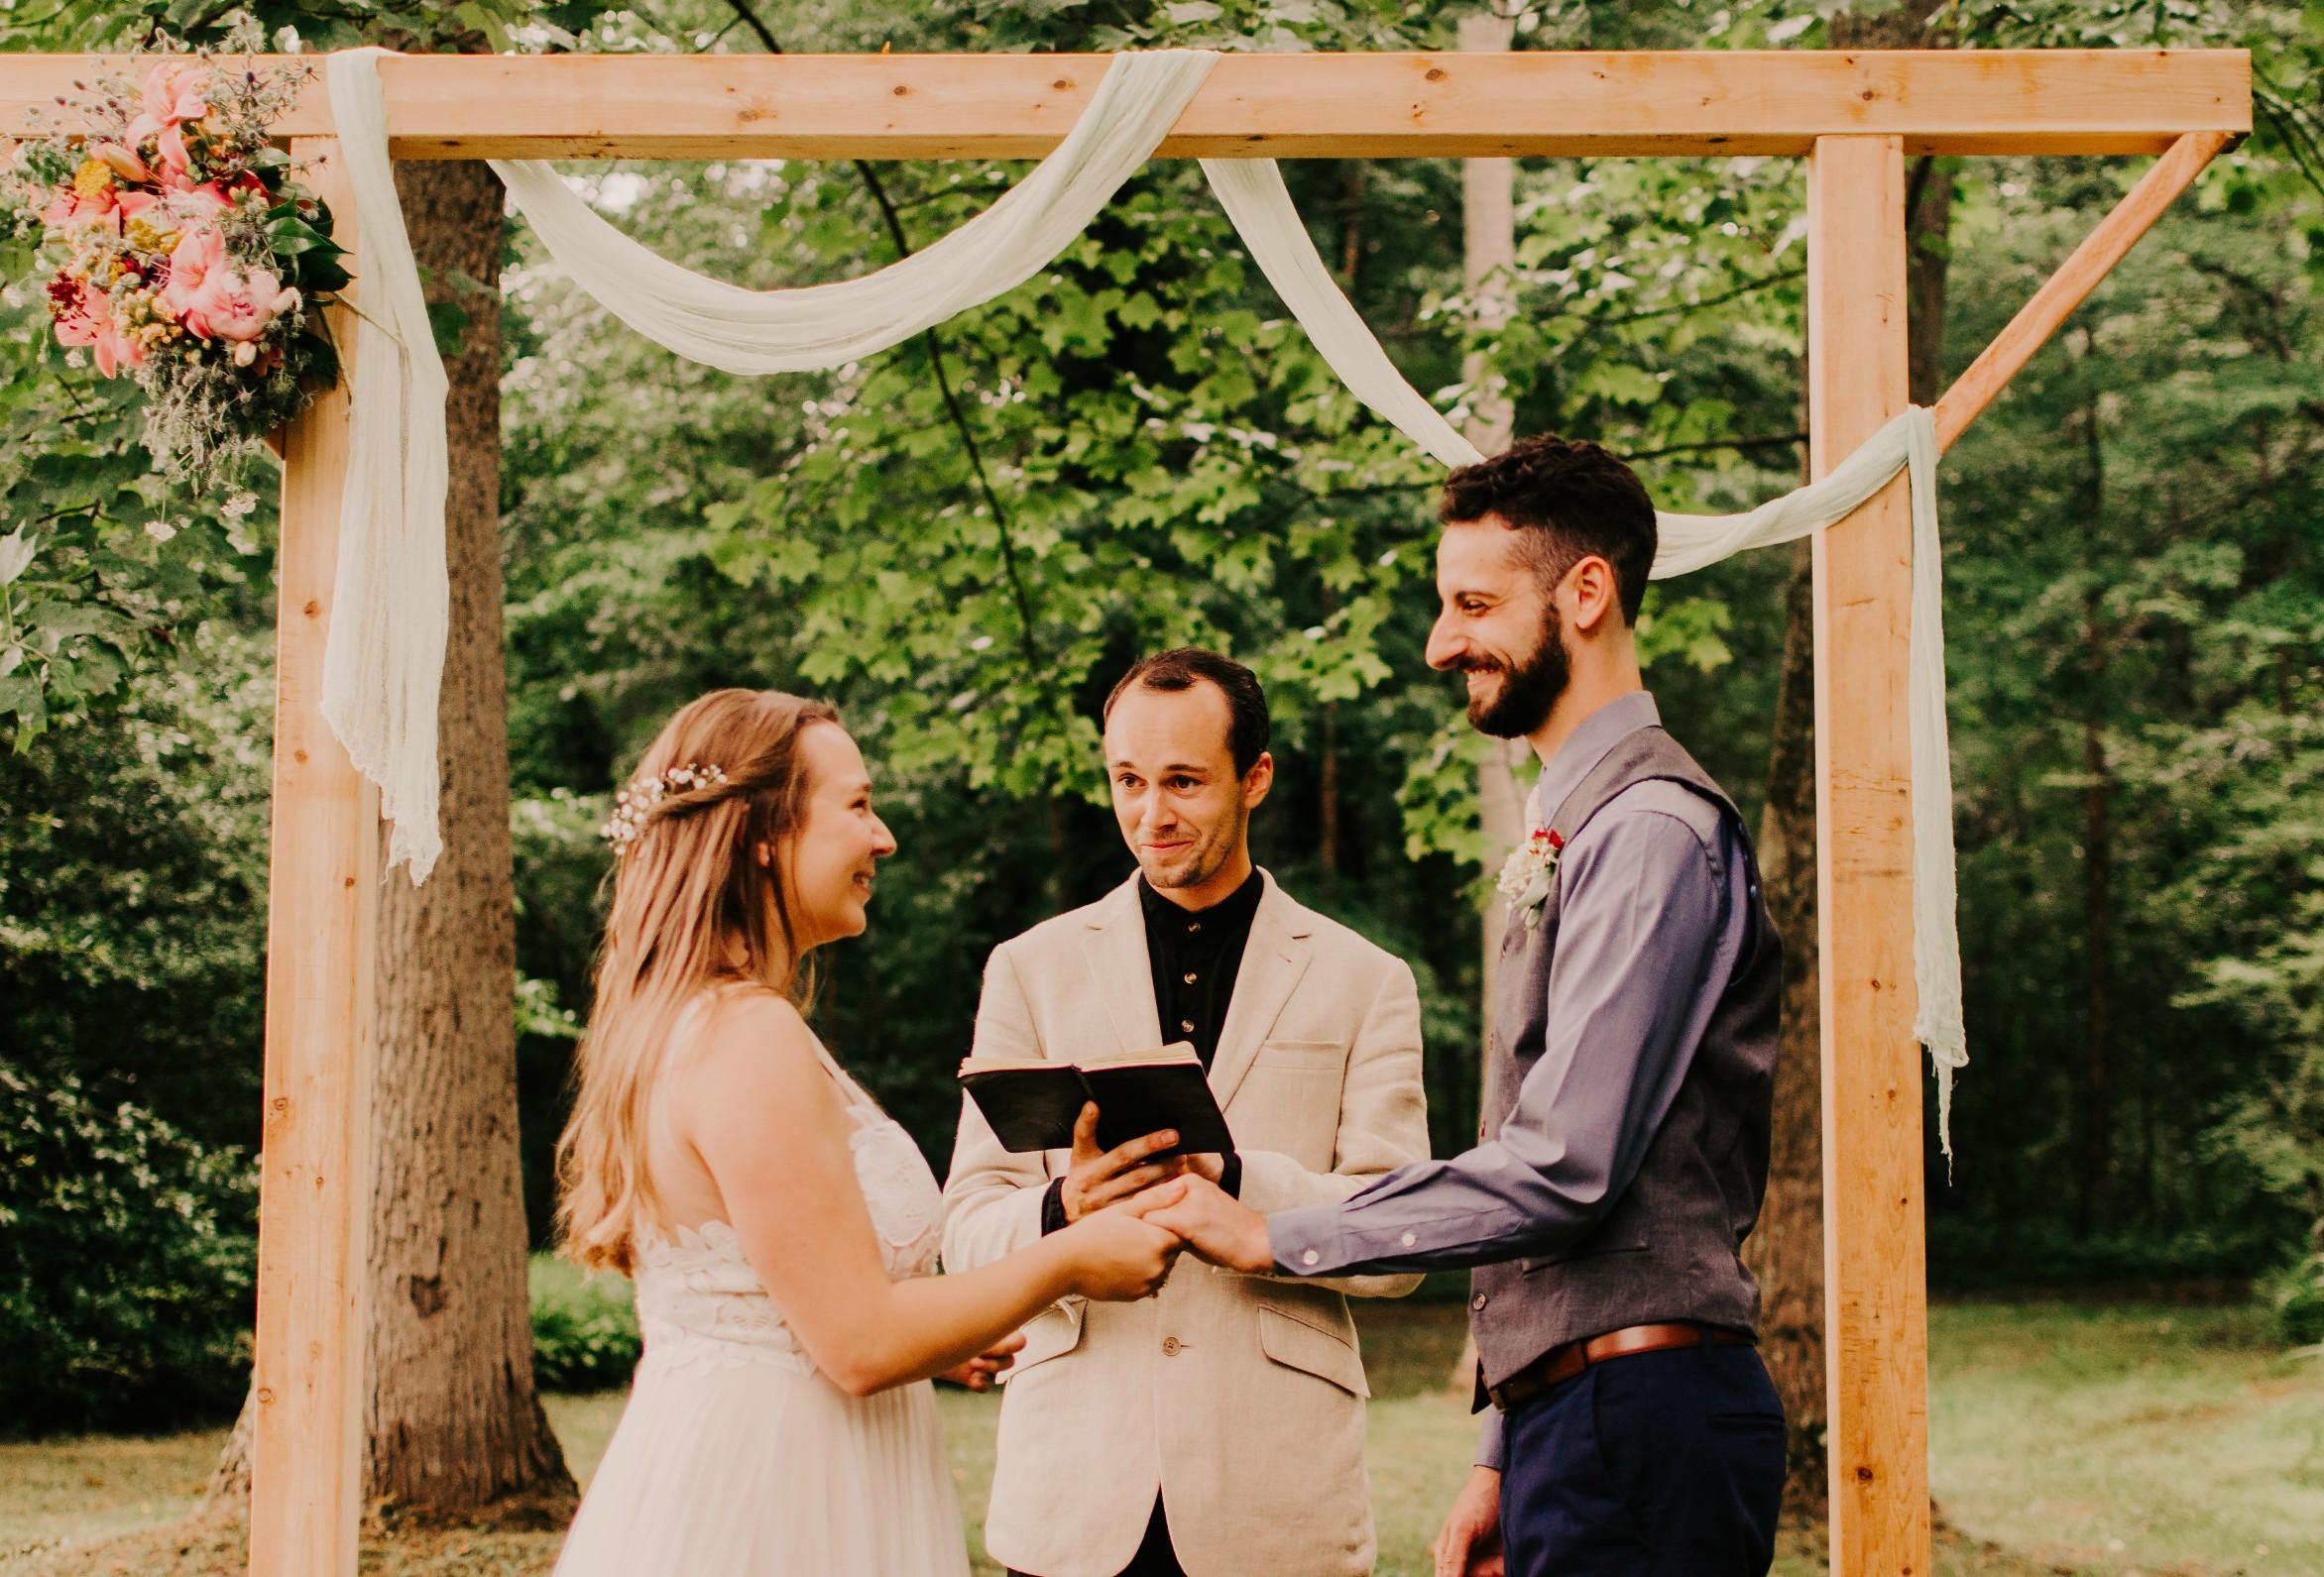 wedding-portrait-photo.jpg.